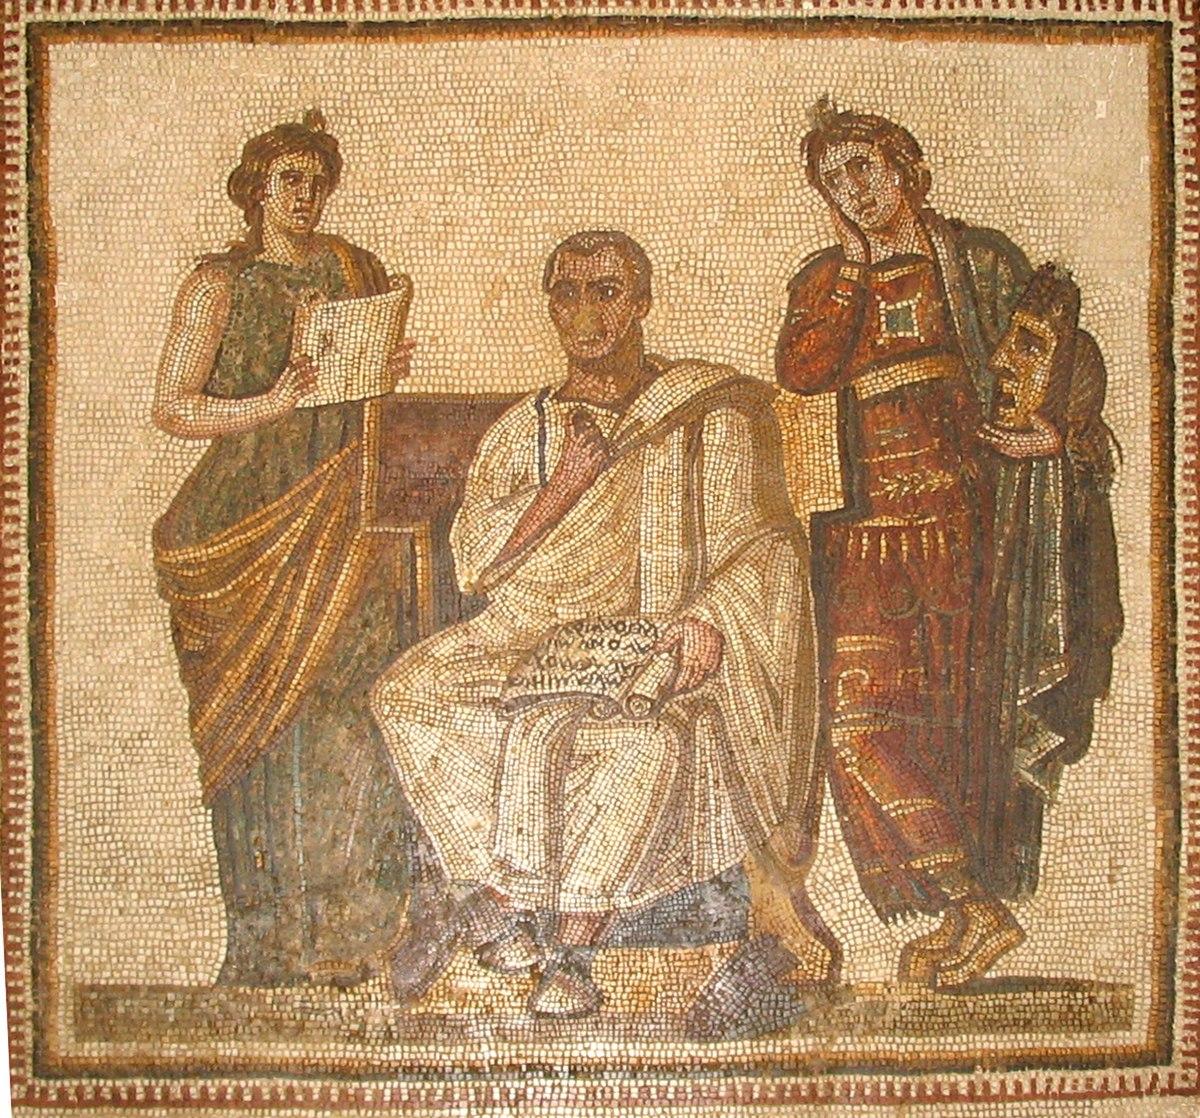 Ancient Medieval Literature: Wikipedia